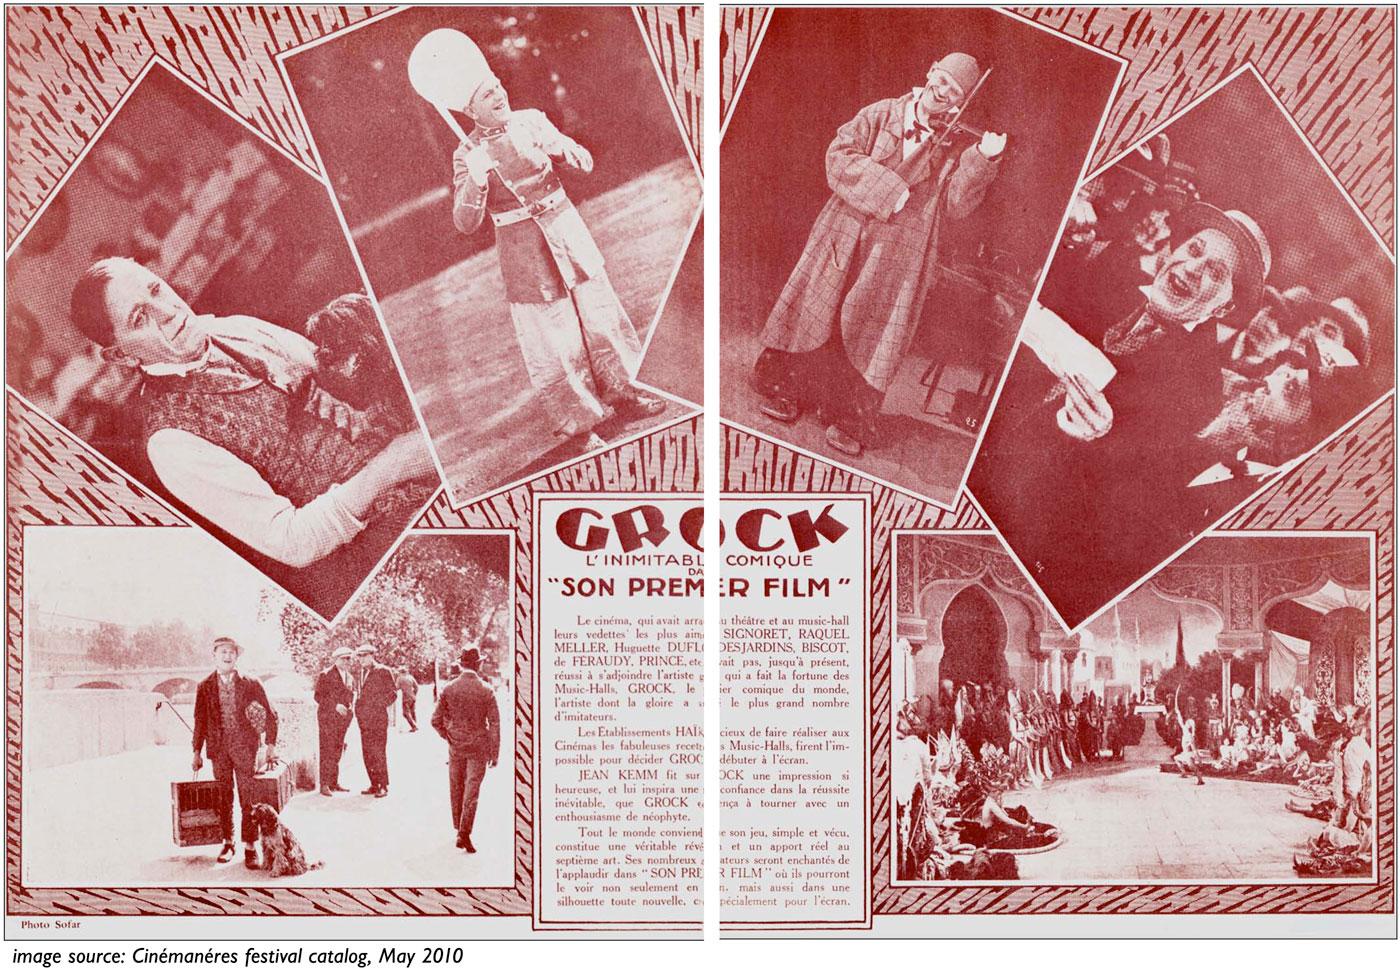 Grock Son Premier Film